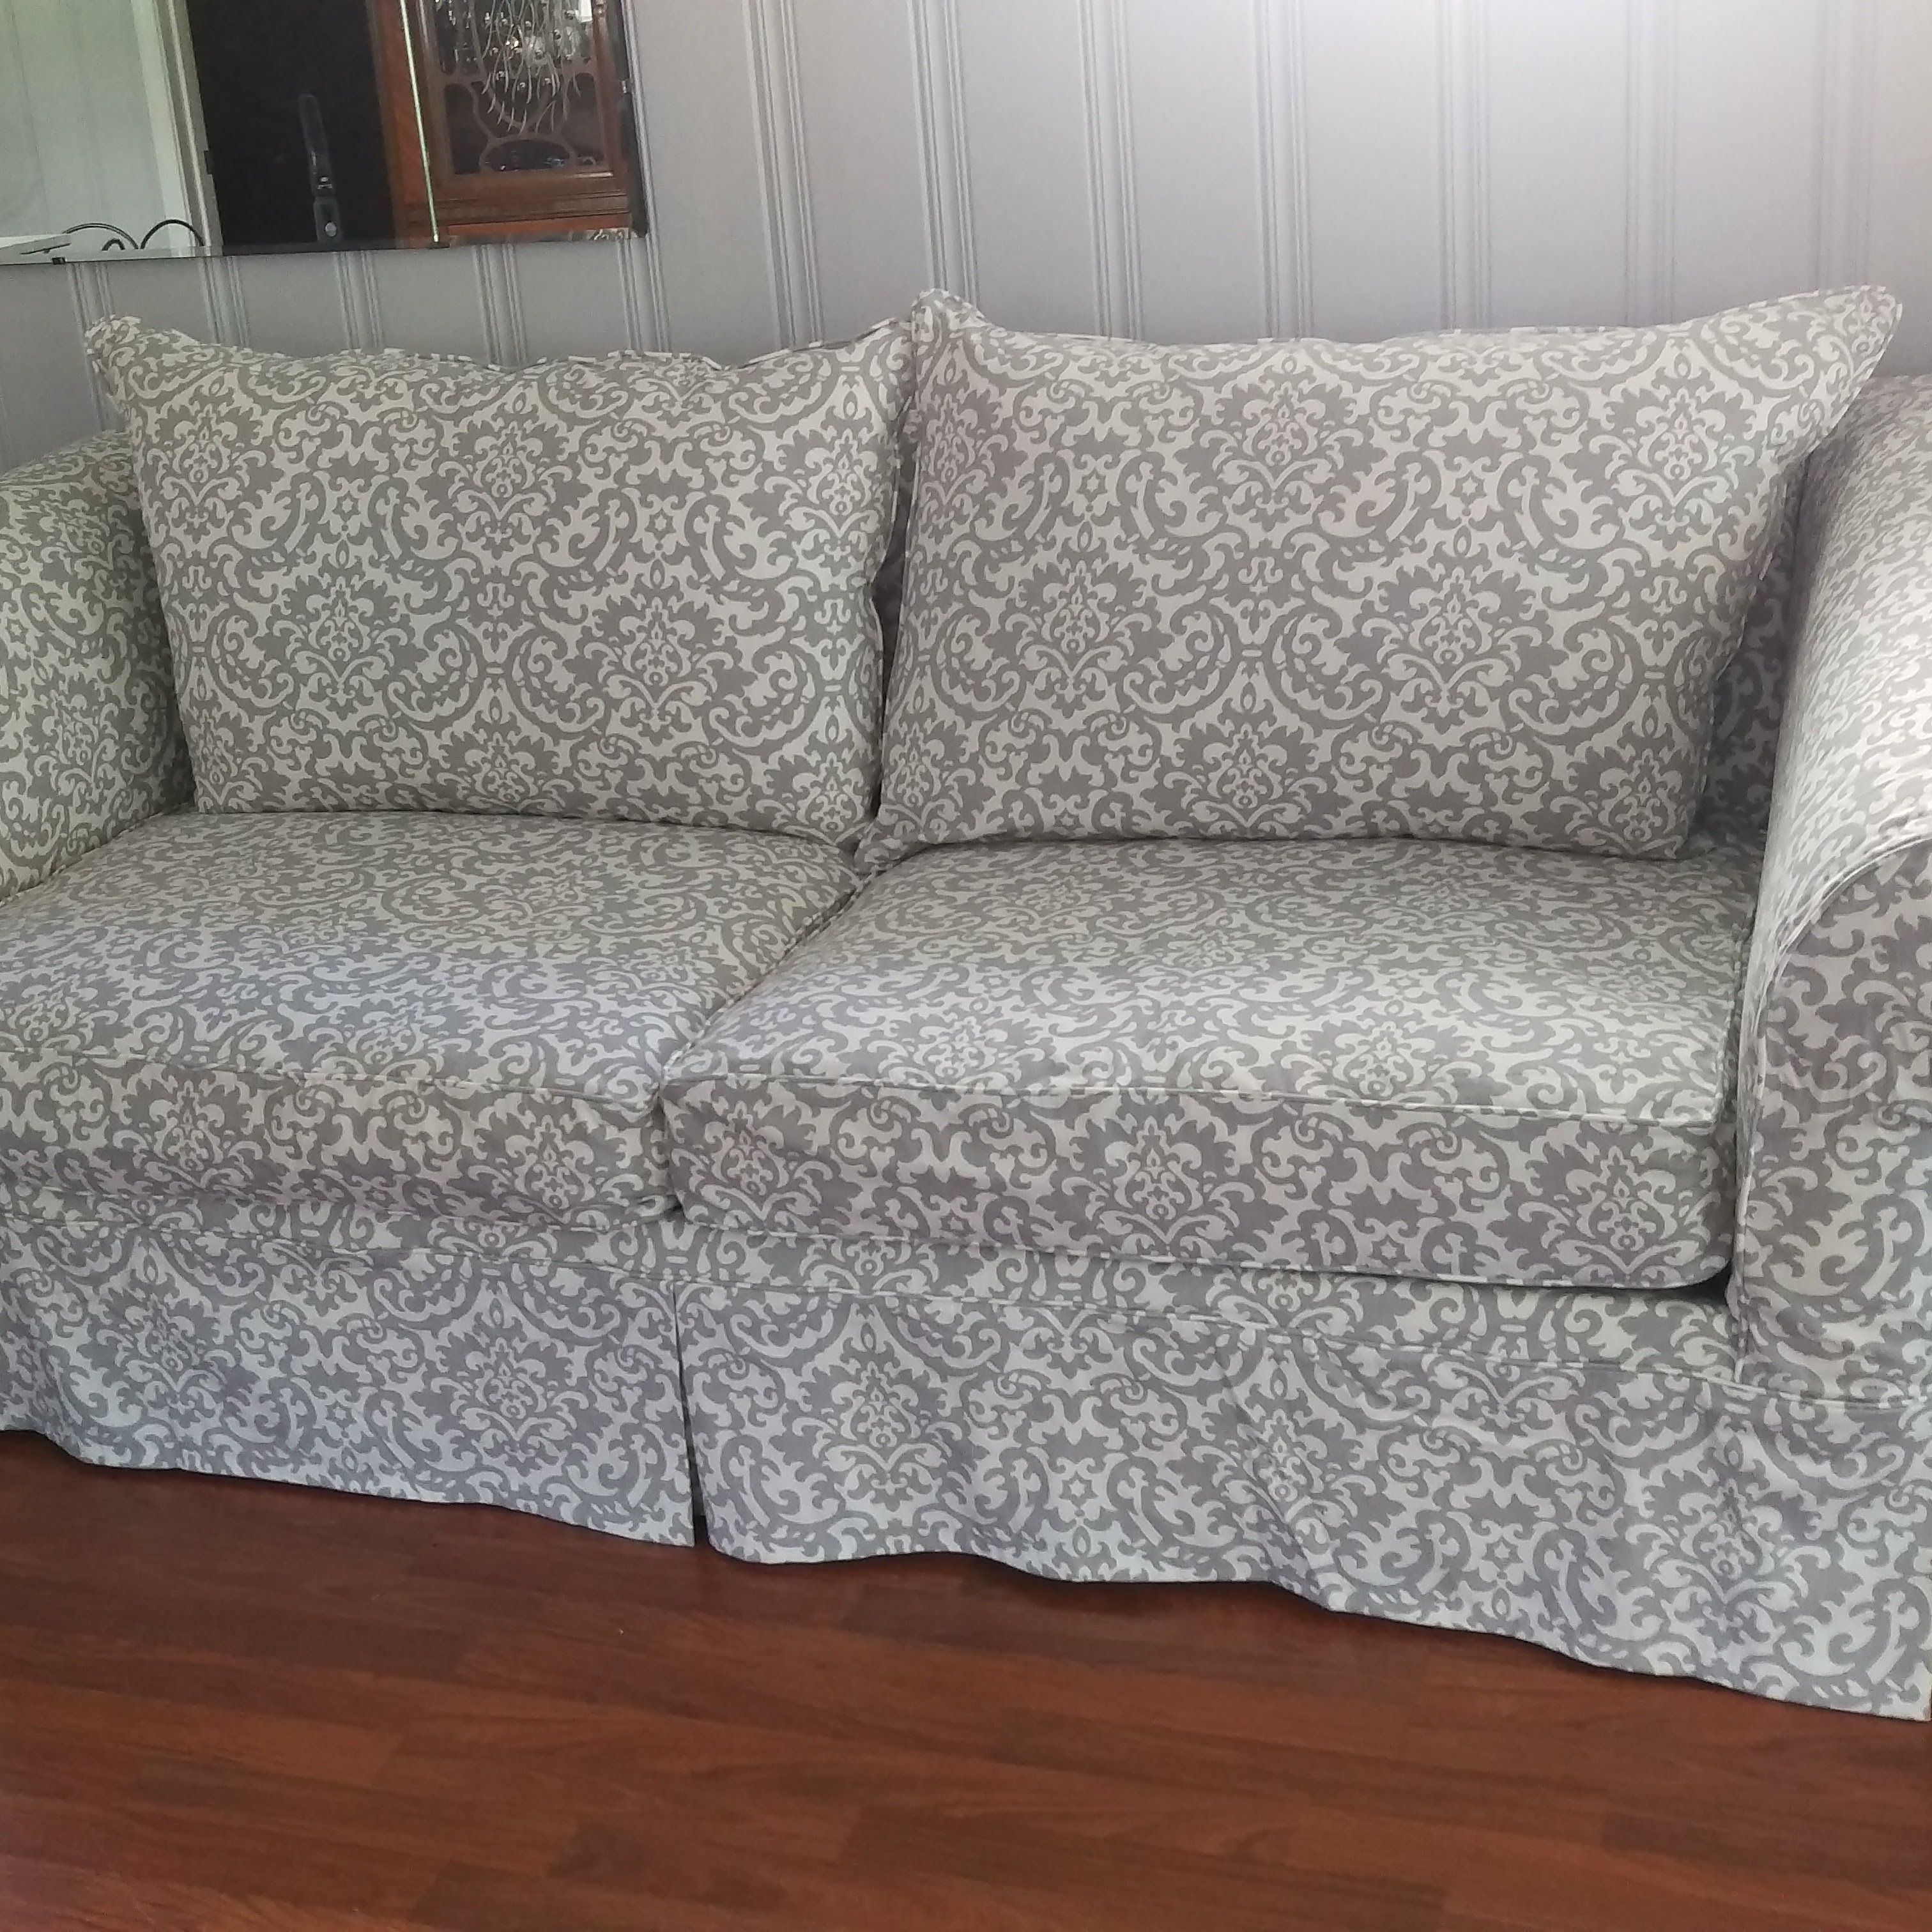 Custom Furniture Slipcovers: Soft And Completely Washable Custom Slipcover